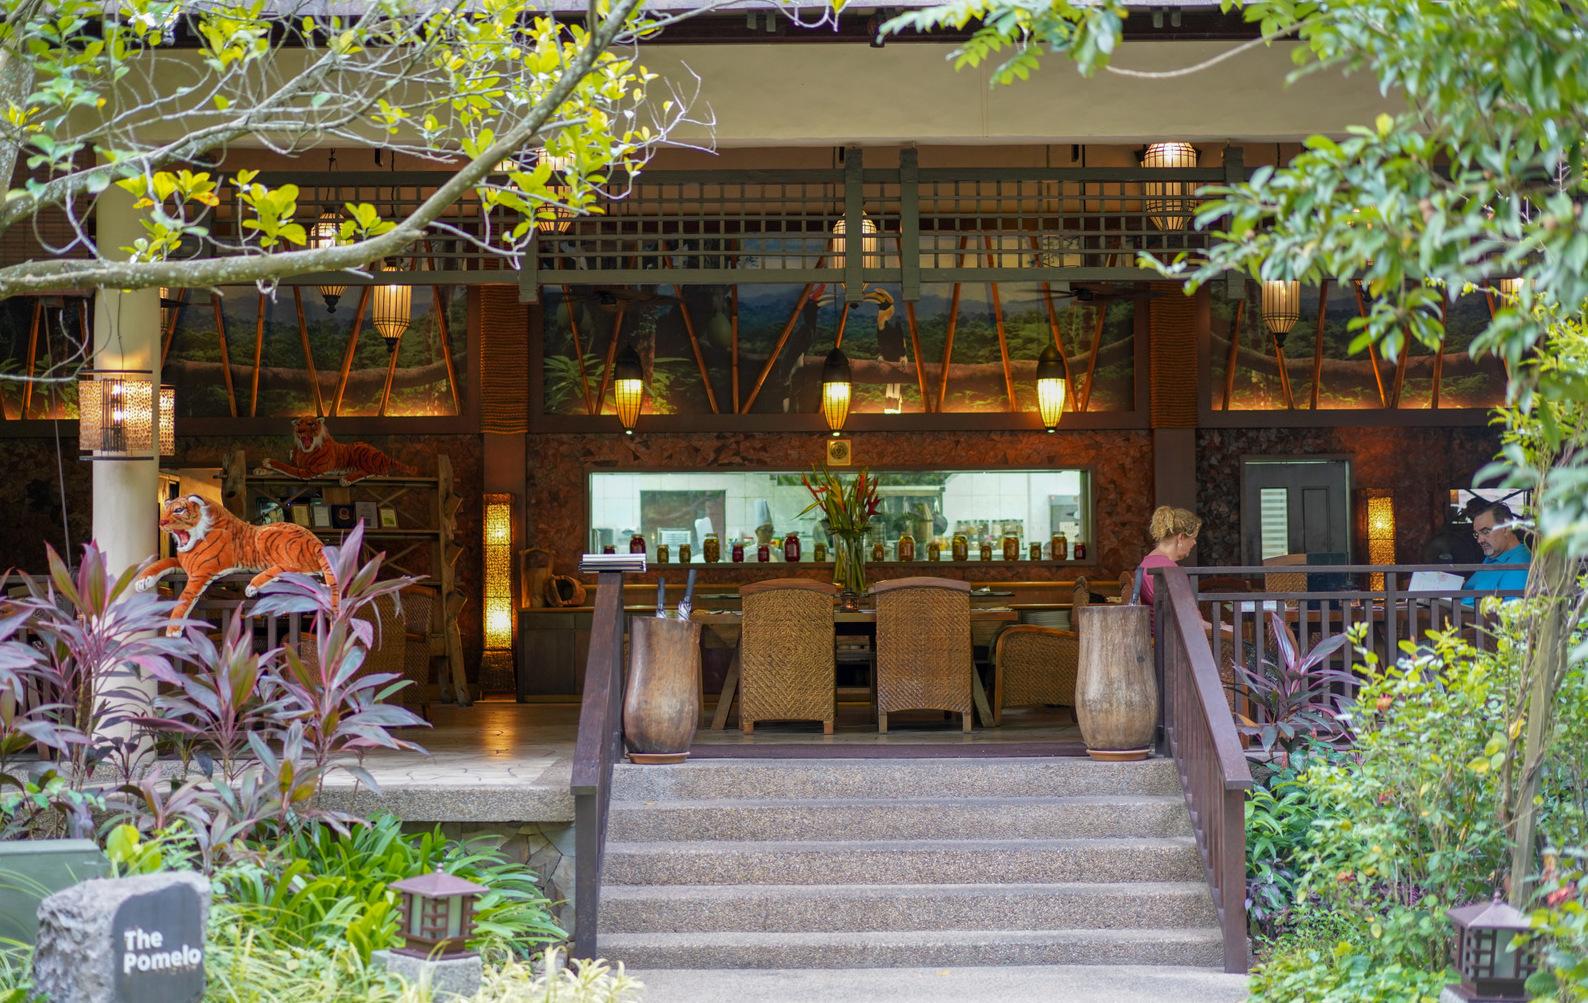 The Pomelo, The Banjaran Hotsprings Retreat, Ipoh